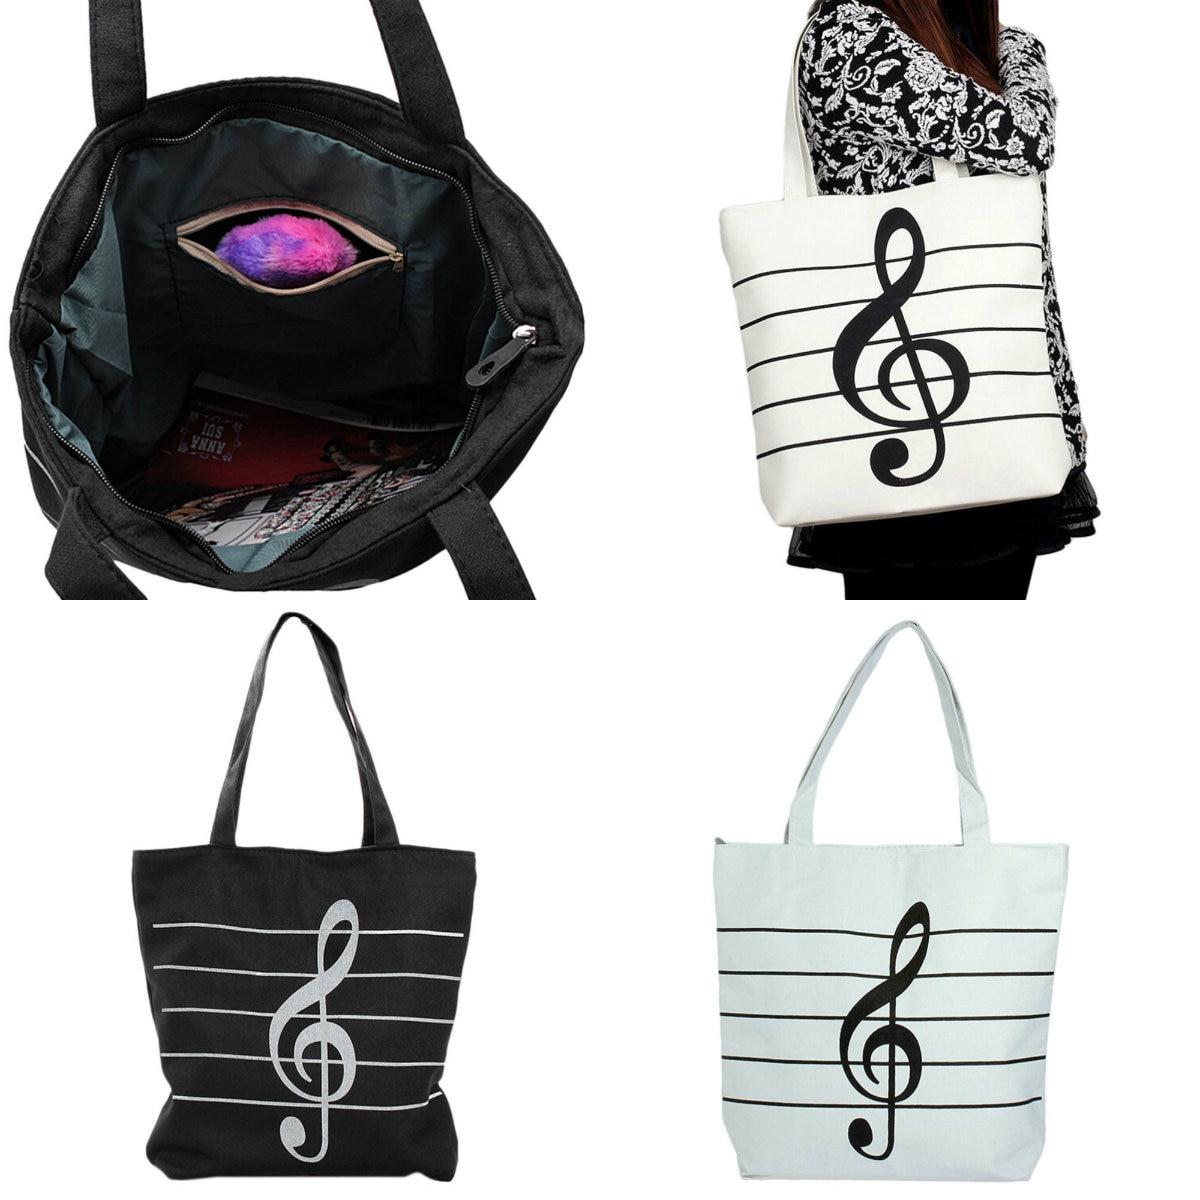 1PC Women Girl Travel Bag Casual Canvas Music Notes Handbag School Satchel Tote Shopping Bag Shoulder Casual Tote Shoulder Bags